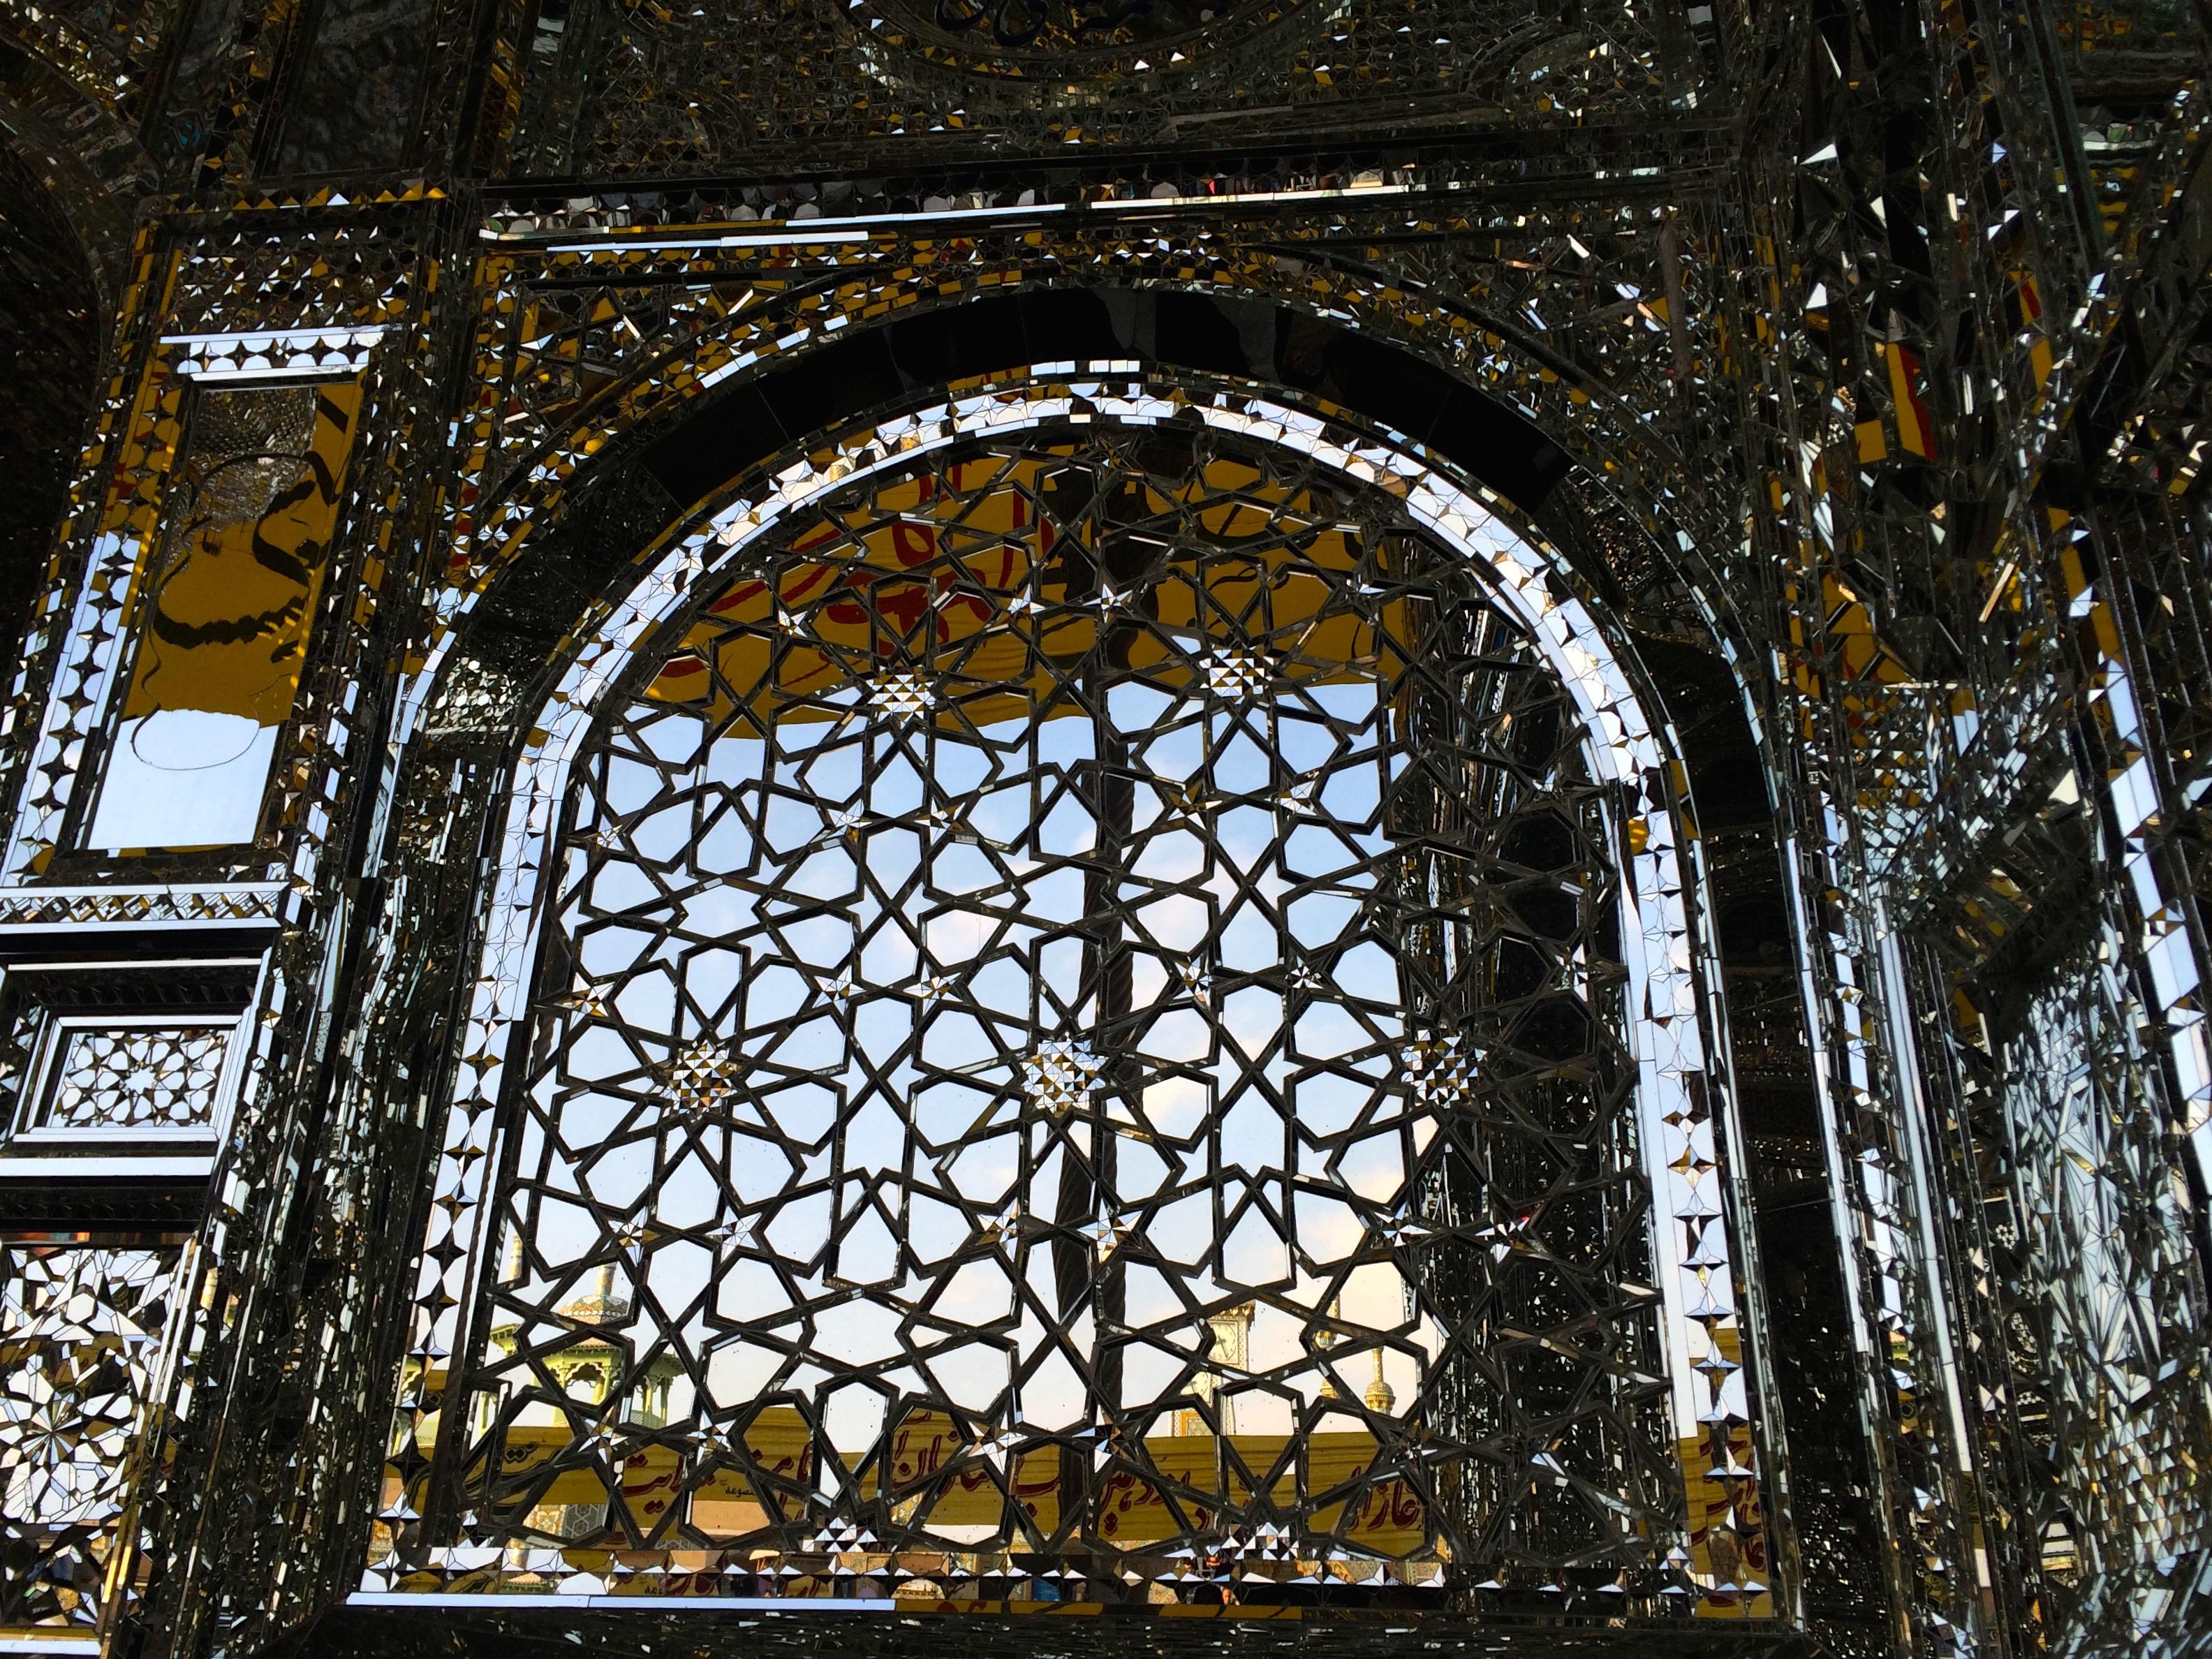 Heirloom Tech: Aineh-Kari Next-Level Mirror Mosaics